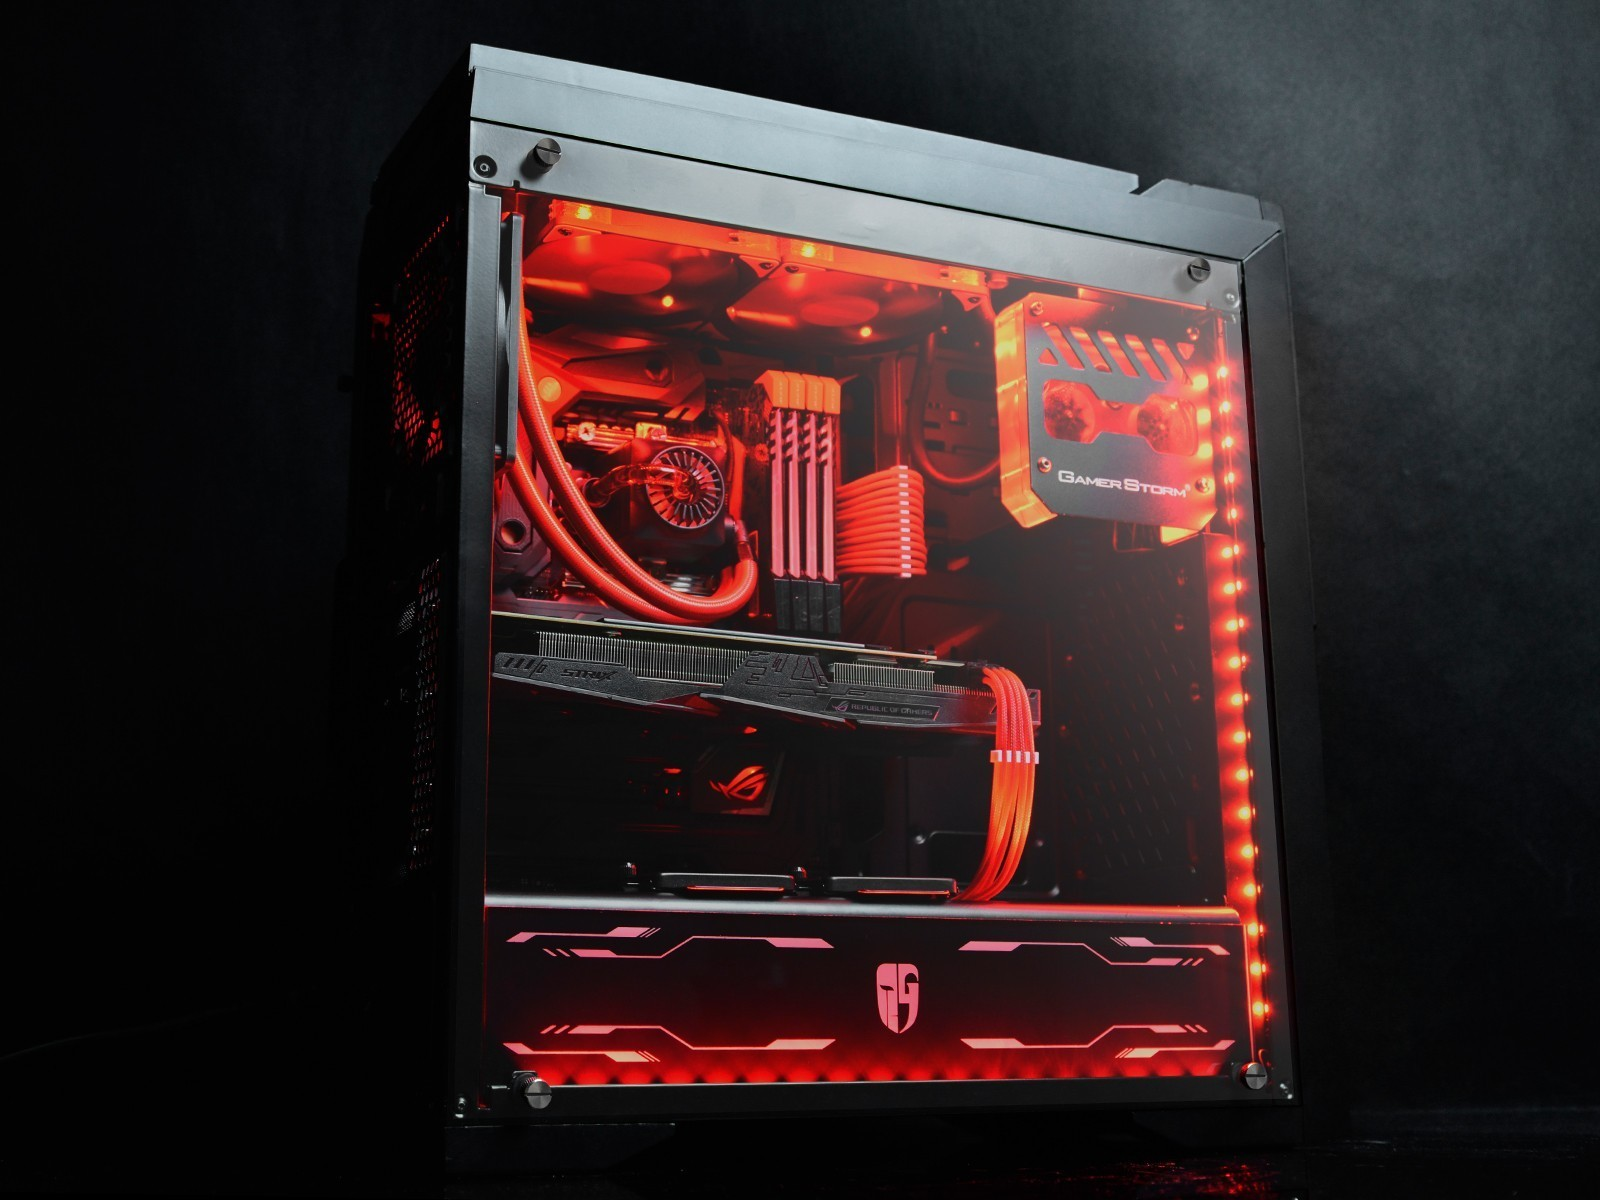 Deepcool Gamerstorm Dukase Liquid Case Black Built In Cooling Deep Cool Z5 Image